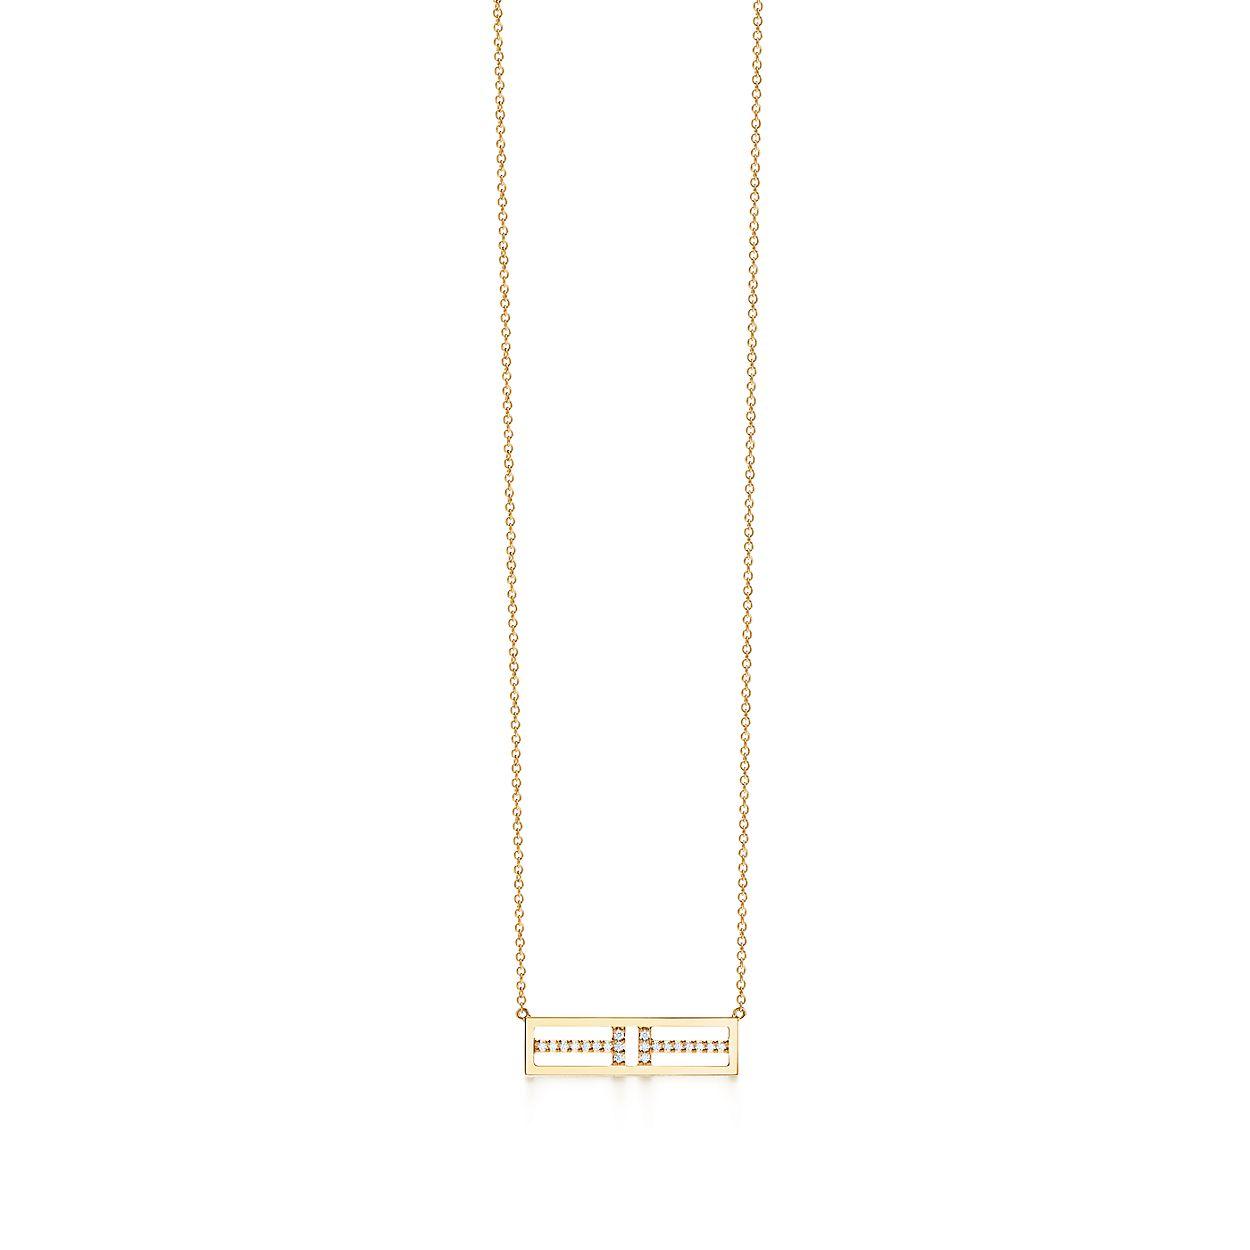 Tiffany t two open horizontal bar pendant in 18k gold with diamonds tiffany ttwo open horizontalbrbar pendant aloadofball Images